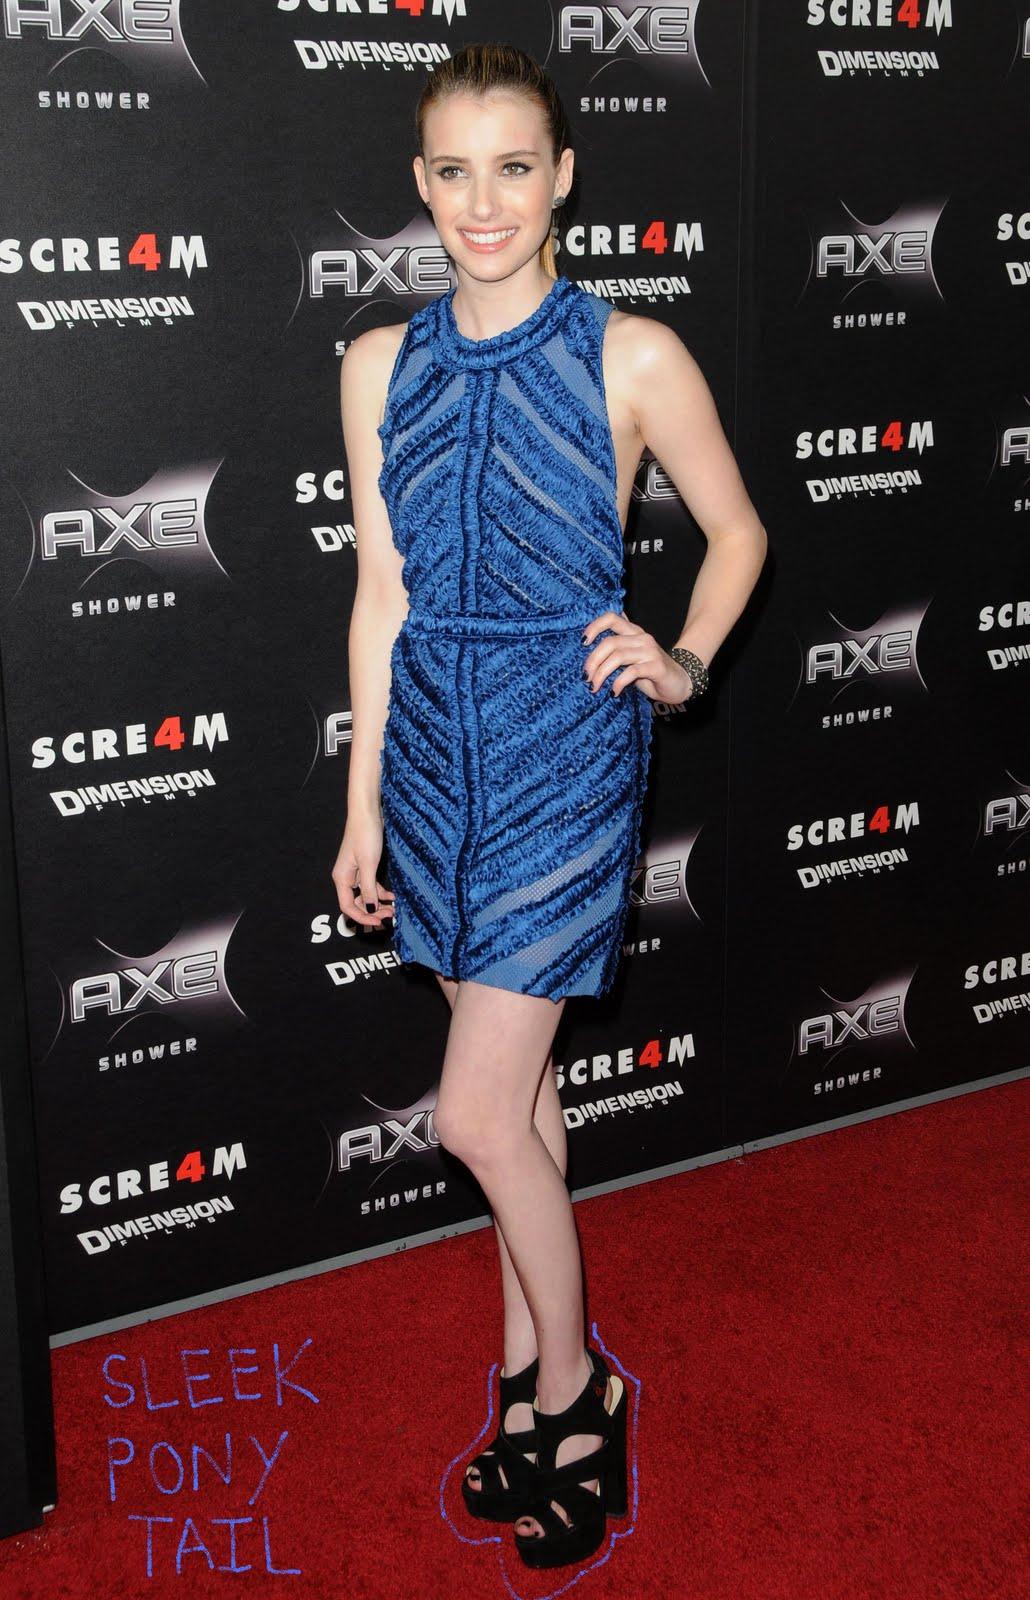 http://3.bp.blogspot.com/-D0jb80H4-lE/ThYODlQAHGI/AAAAAAAABNE/qR5KOl8s61Q/s1600/Emma-Roberts-Scream-4-Blue-Dress-Full.jpg